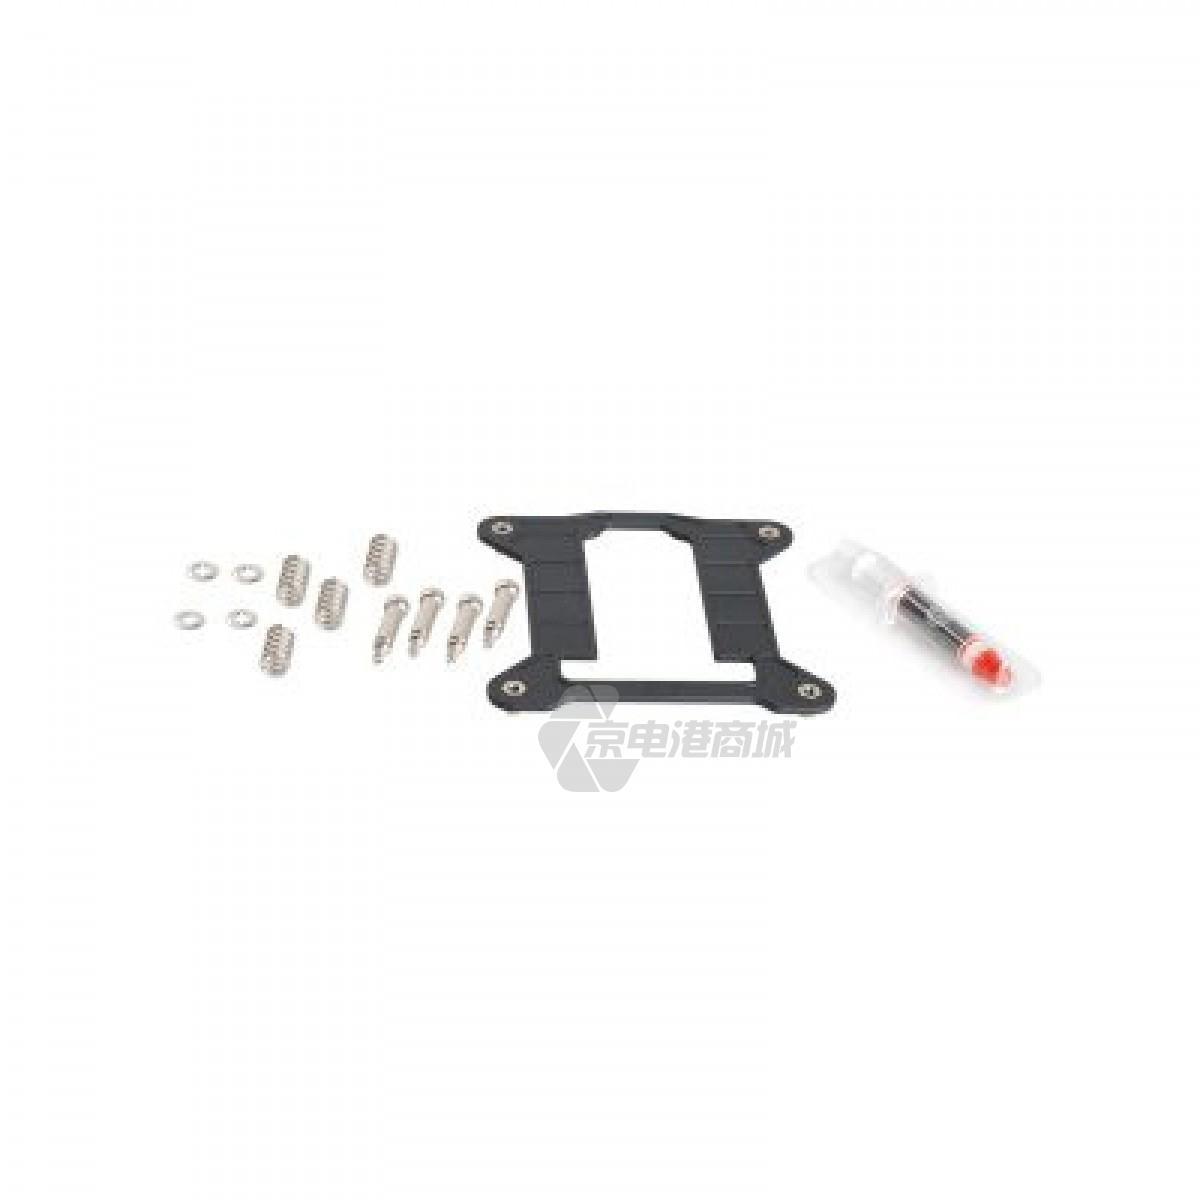 EVERCOOL LGA115X ES 92x89x8mm Compatible For INTEL LGA 115X SOCKET